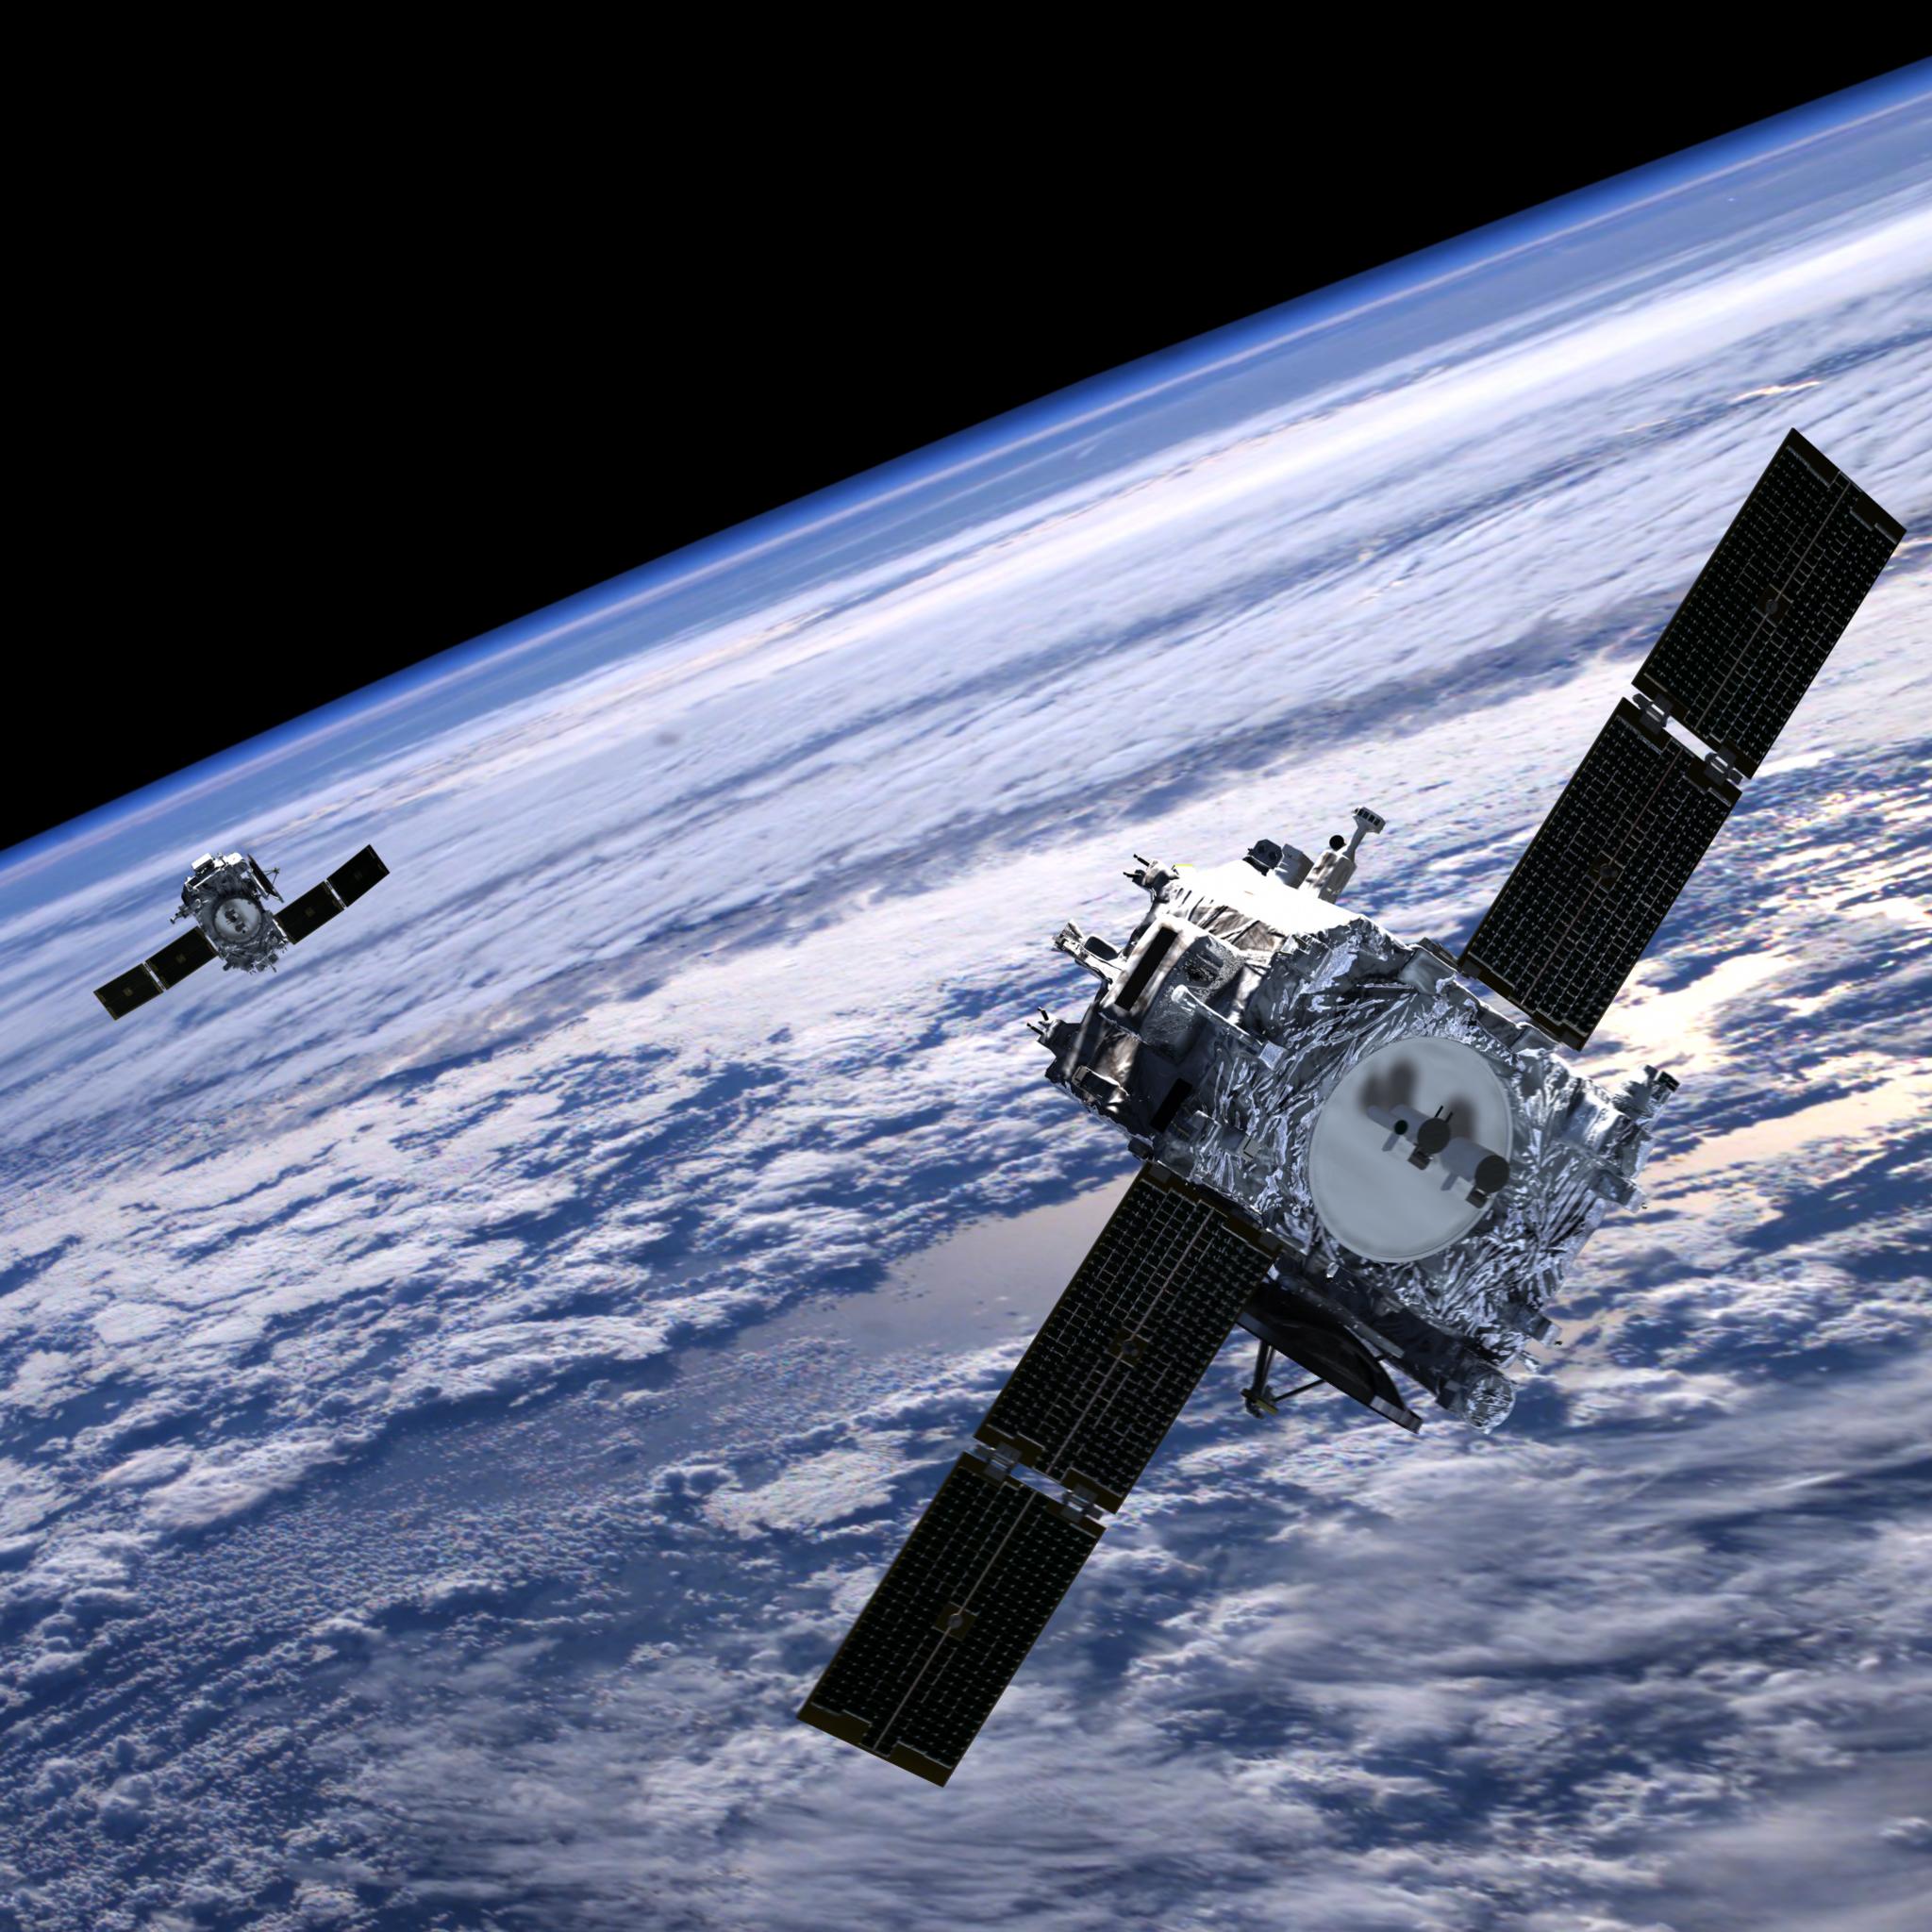 Space based solar array, image courtest NASA.gov